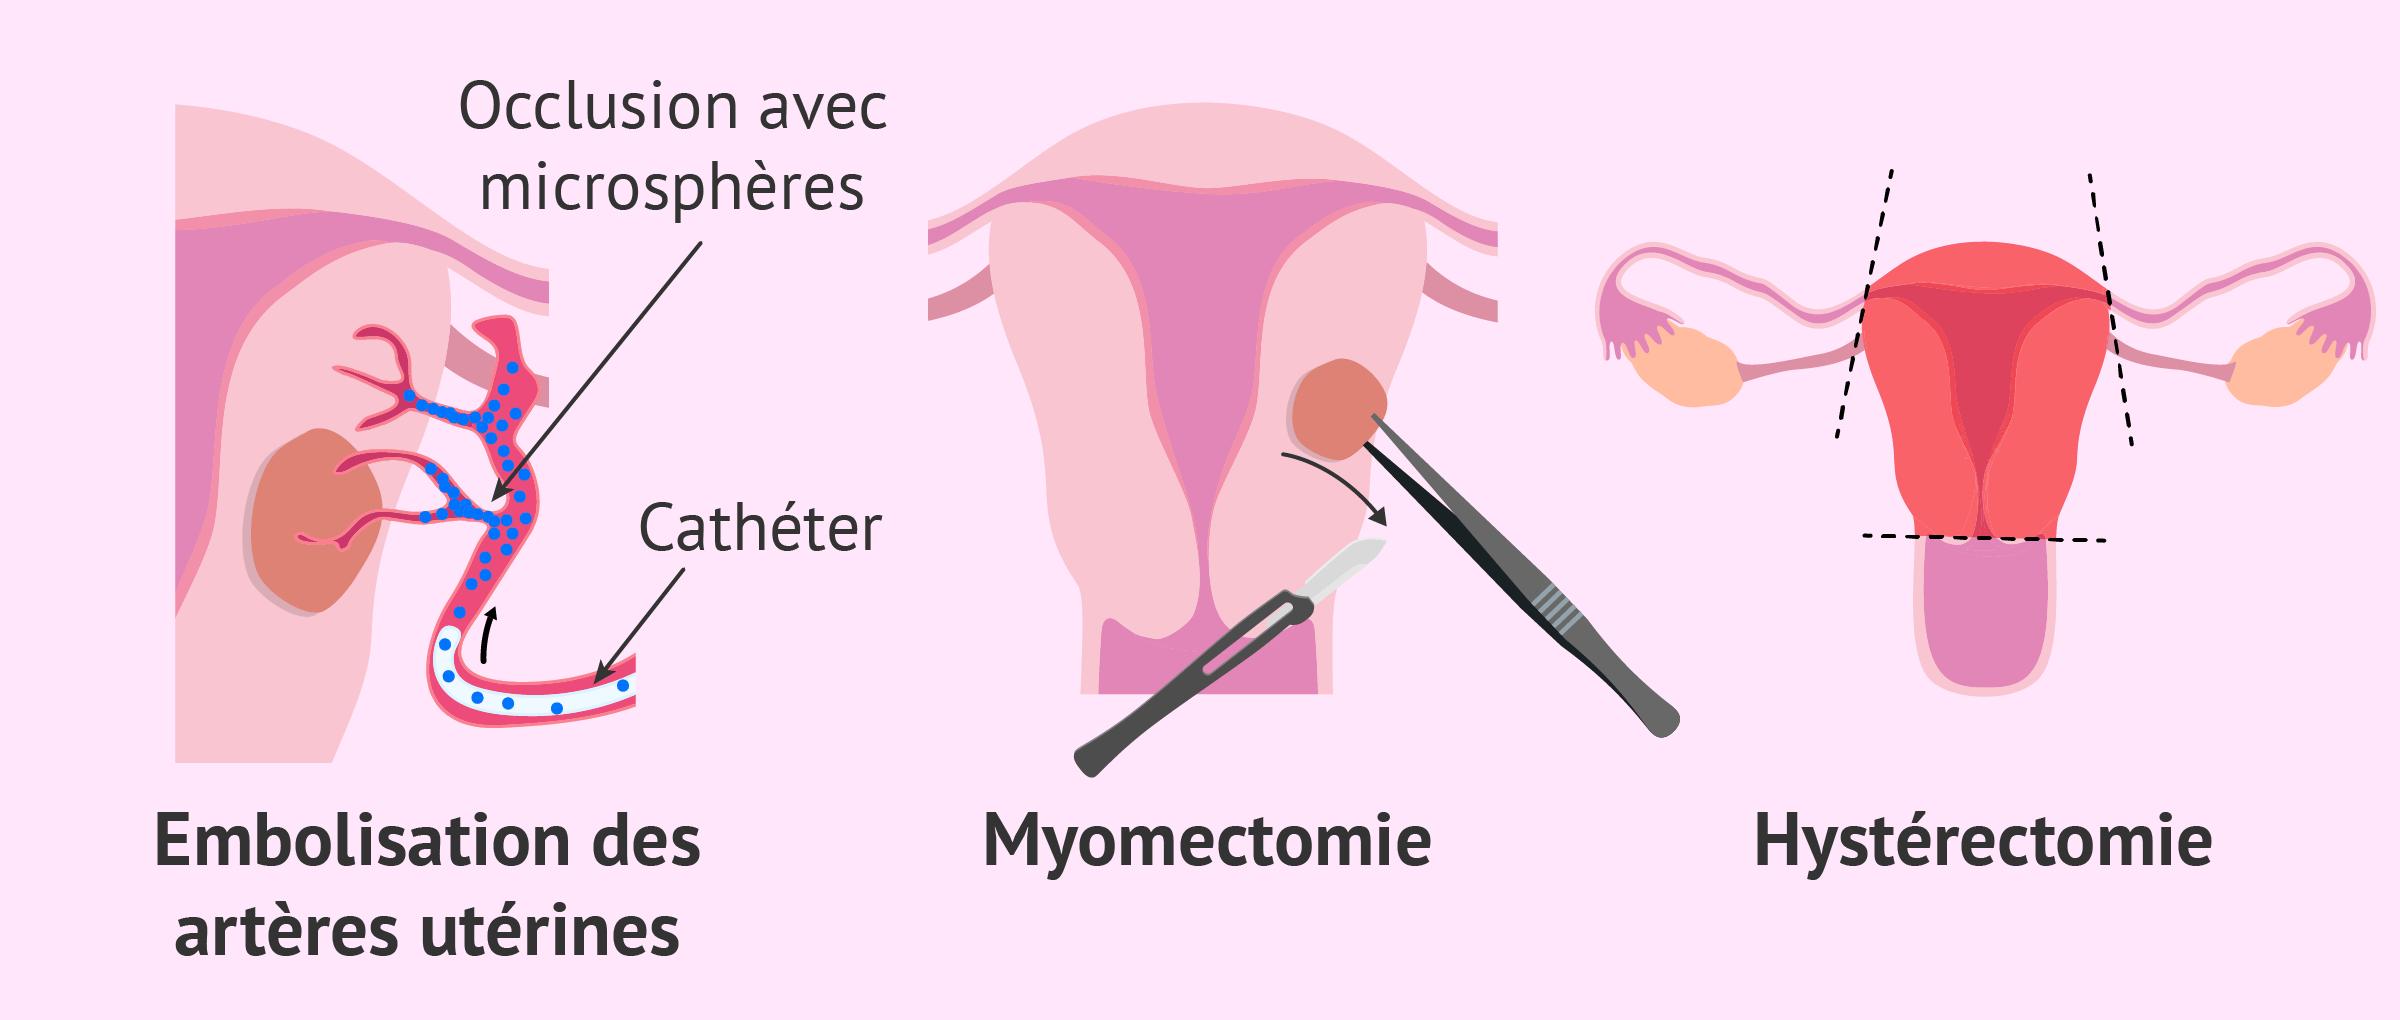 Traitements invasifs de la myomatose